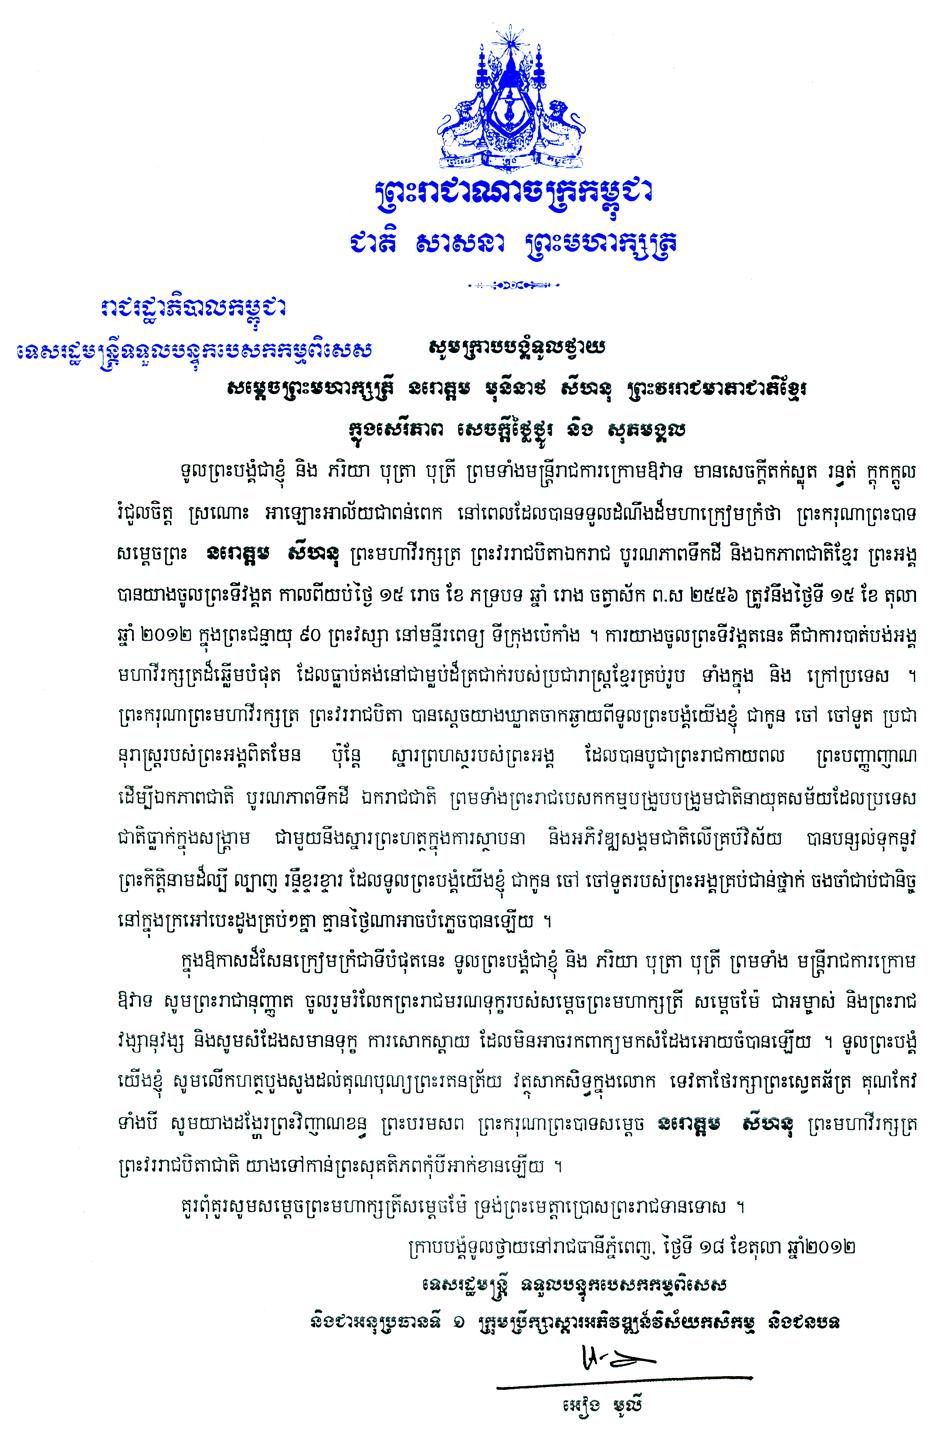 All/correspondance/CorrespondancePrive/2012/Novembre/id1009/photo001.jpg